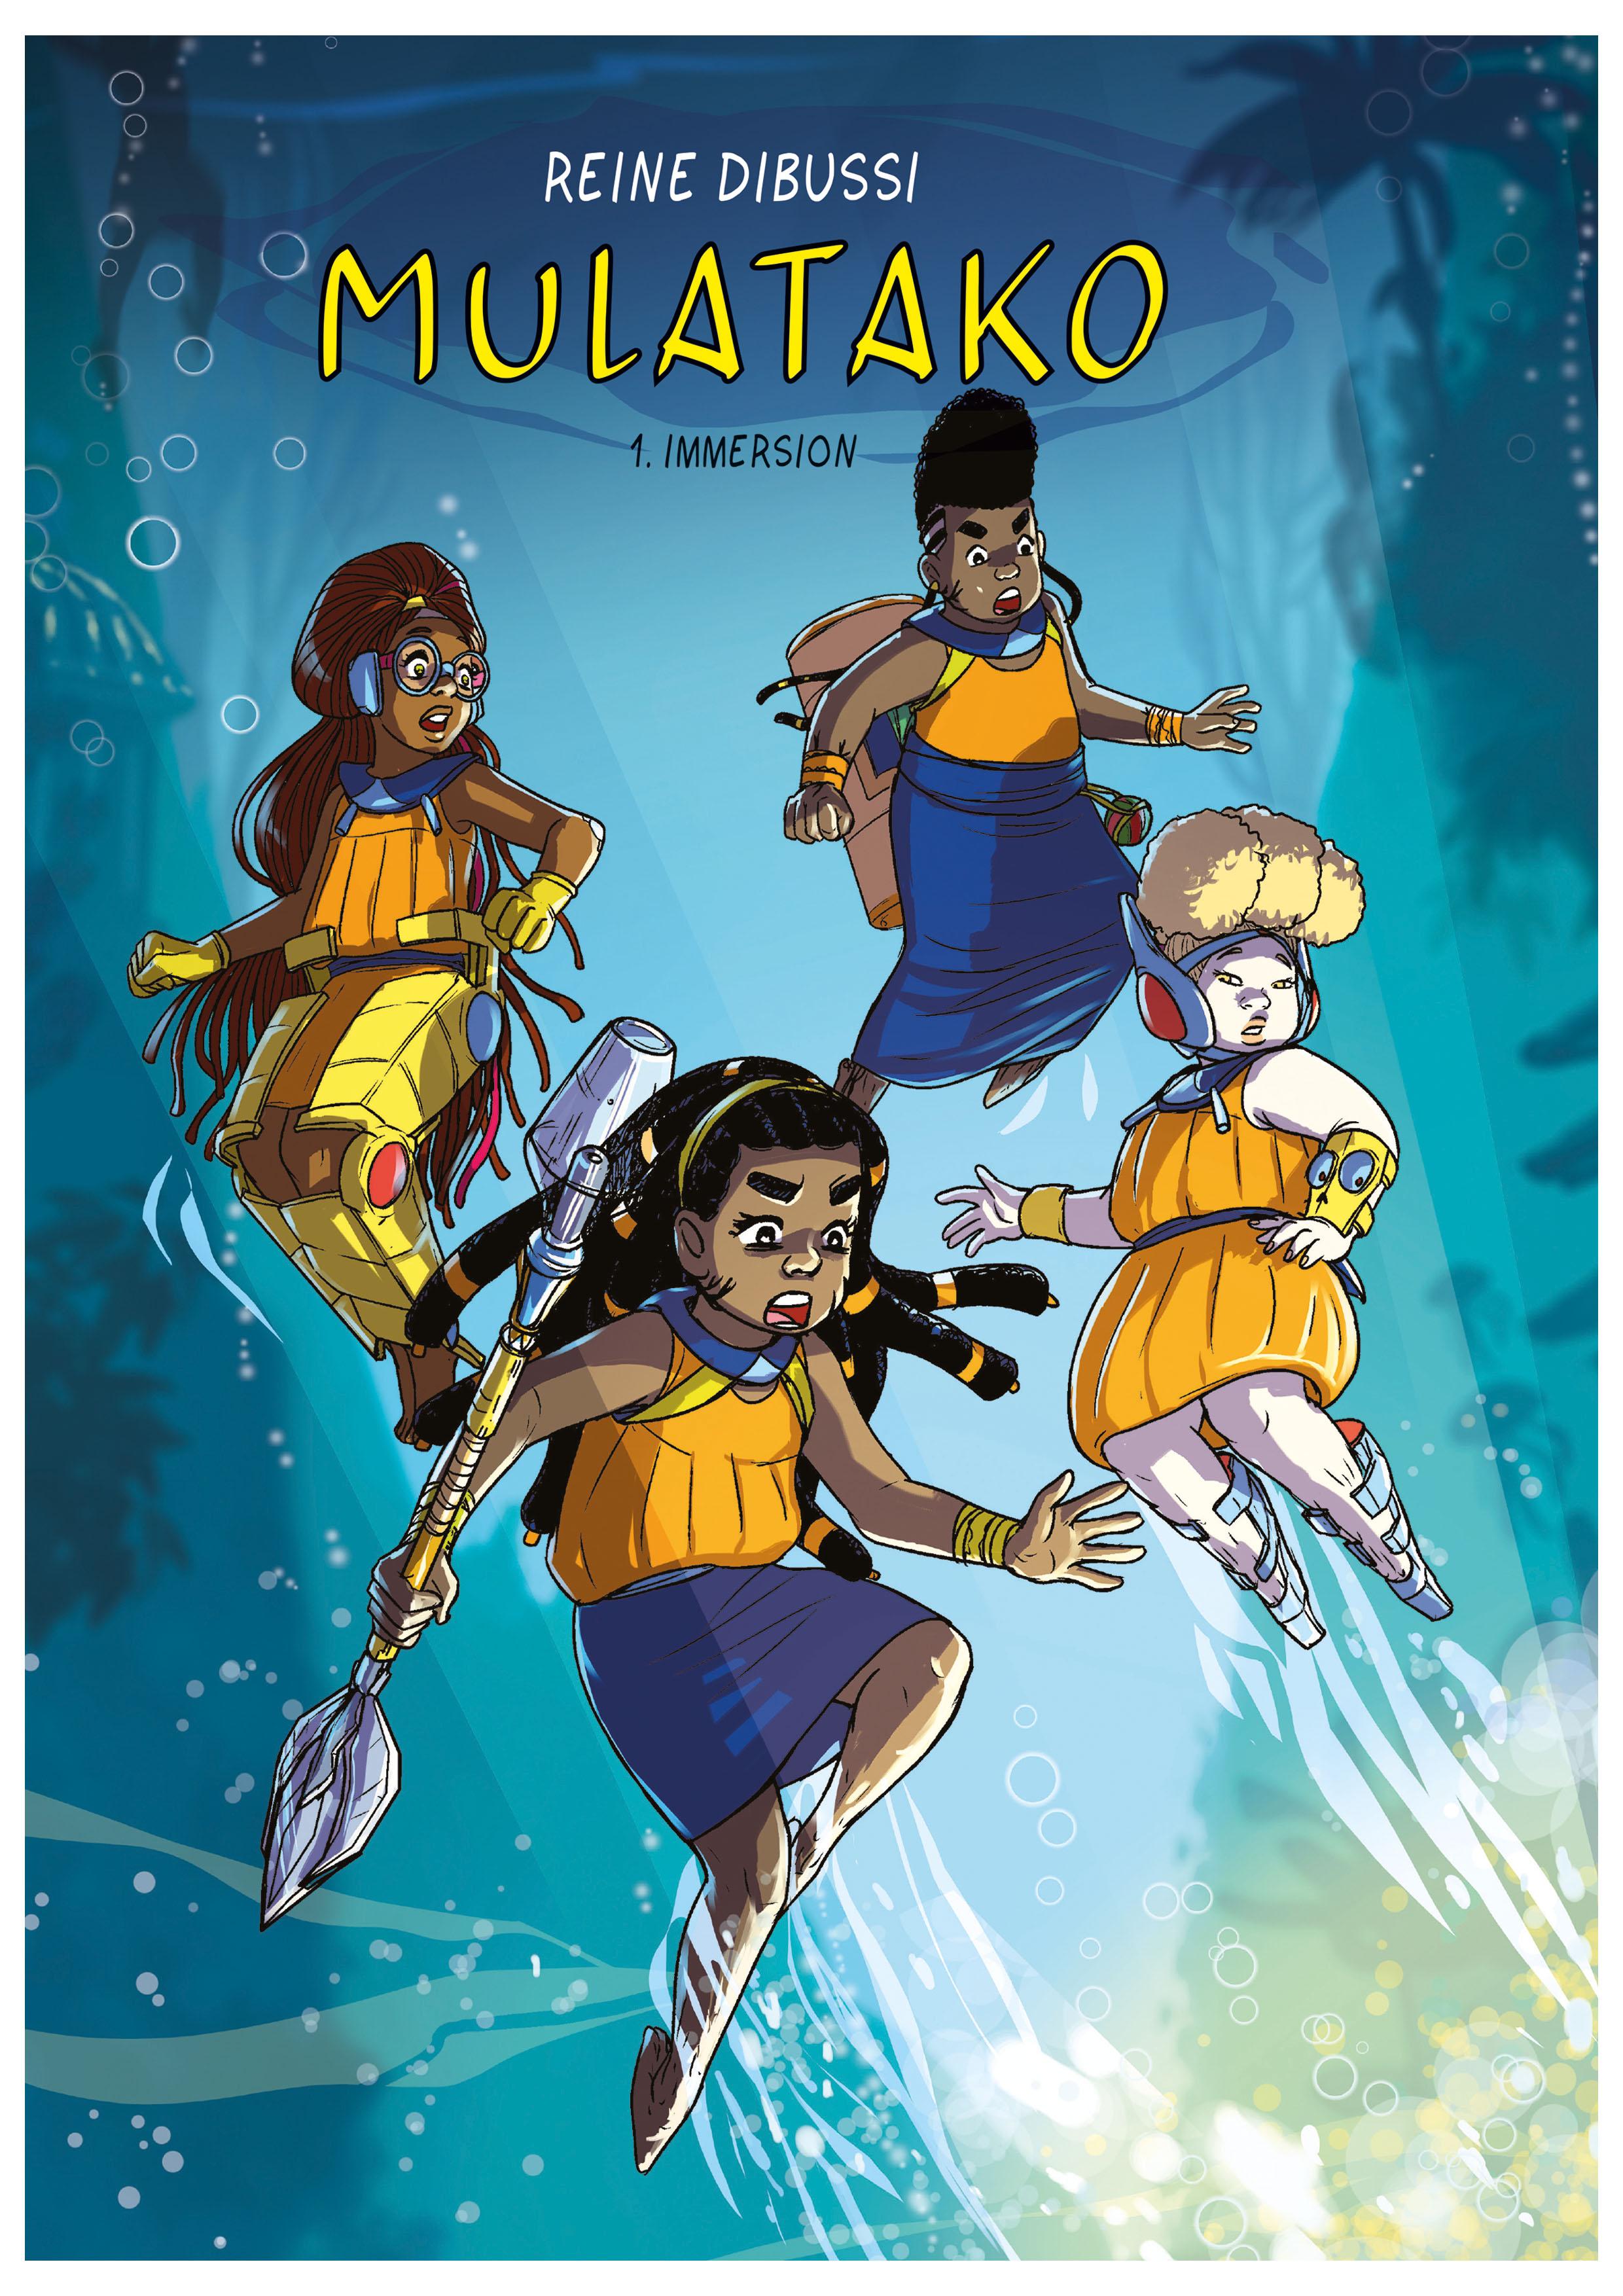 La couverture de Mulatako, de Reine Dibussi.